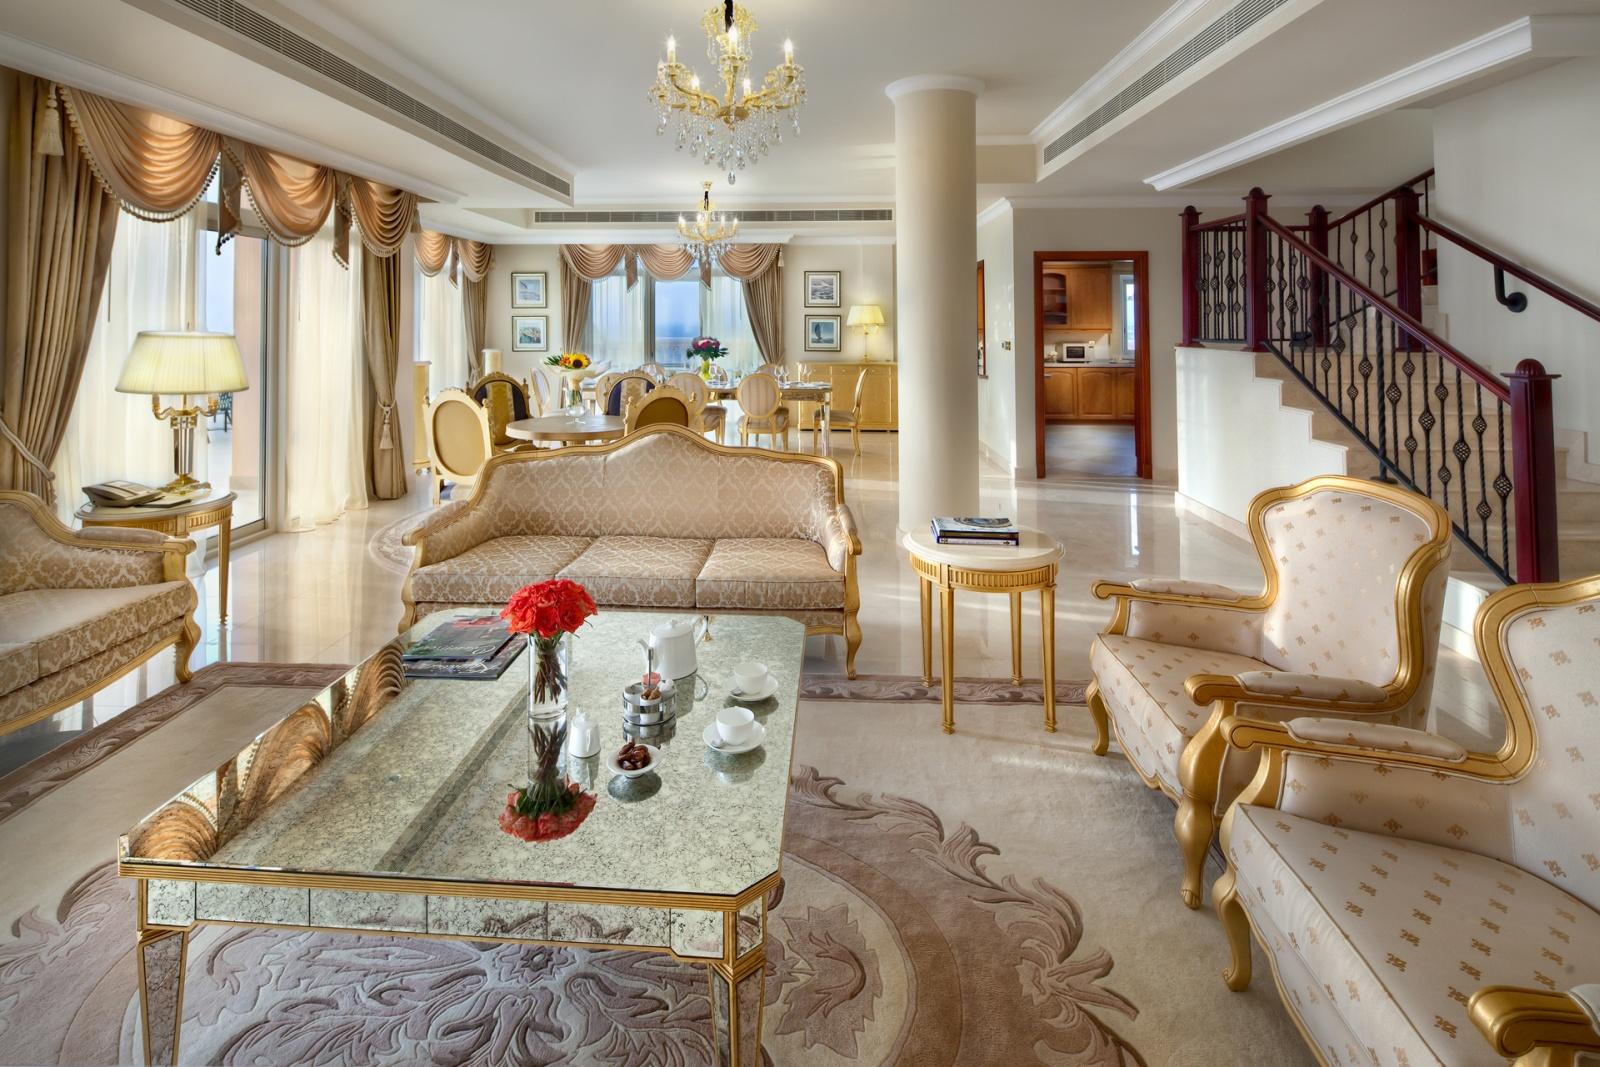 Kempinski hotel residences palm jumeirah